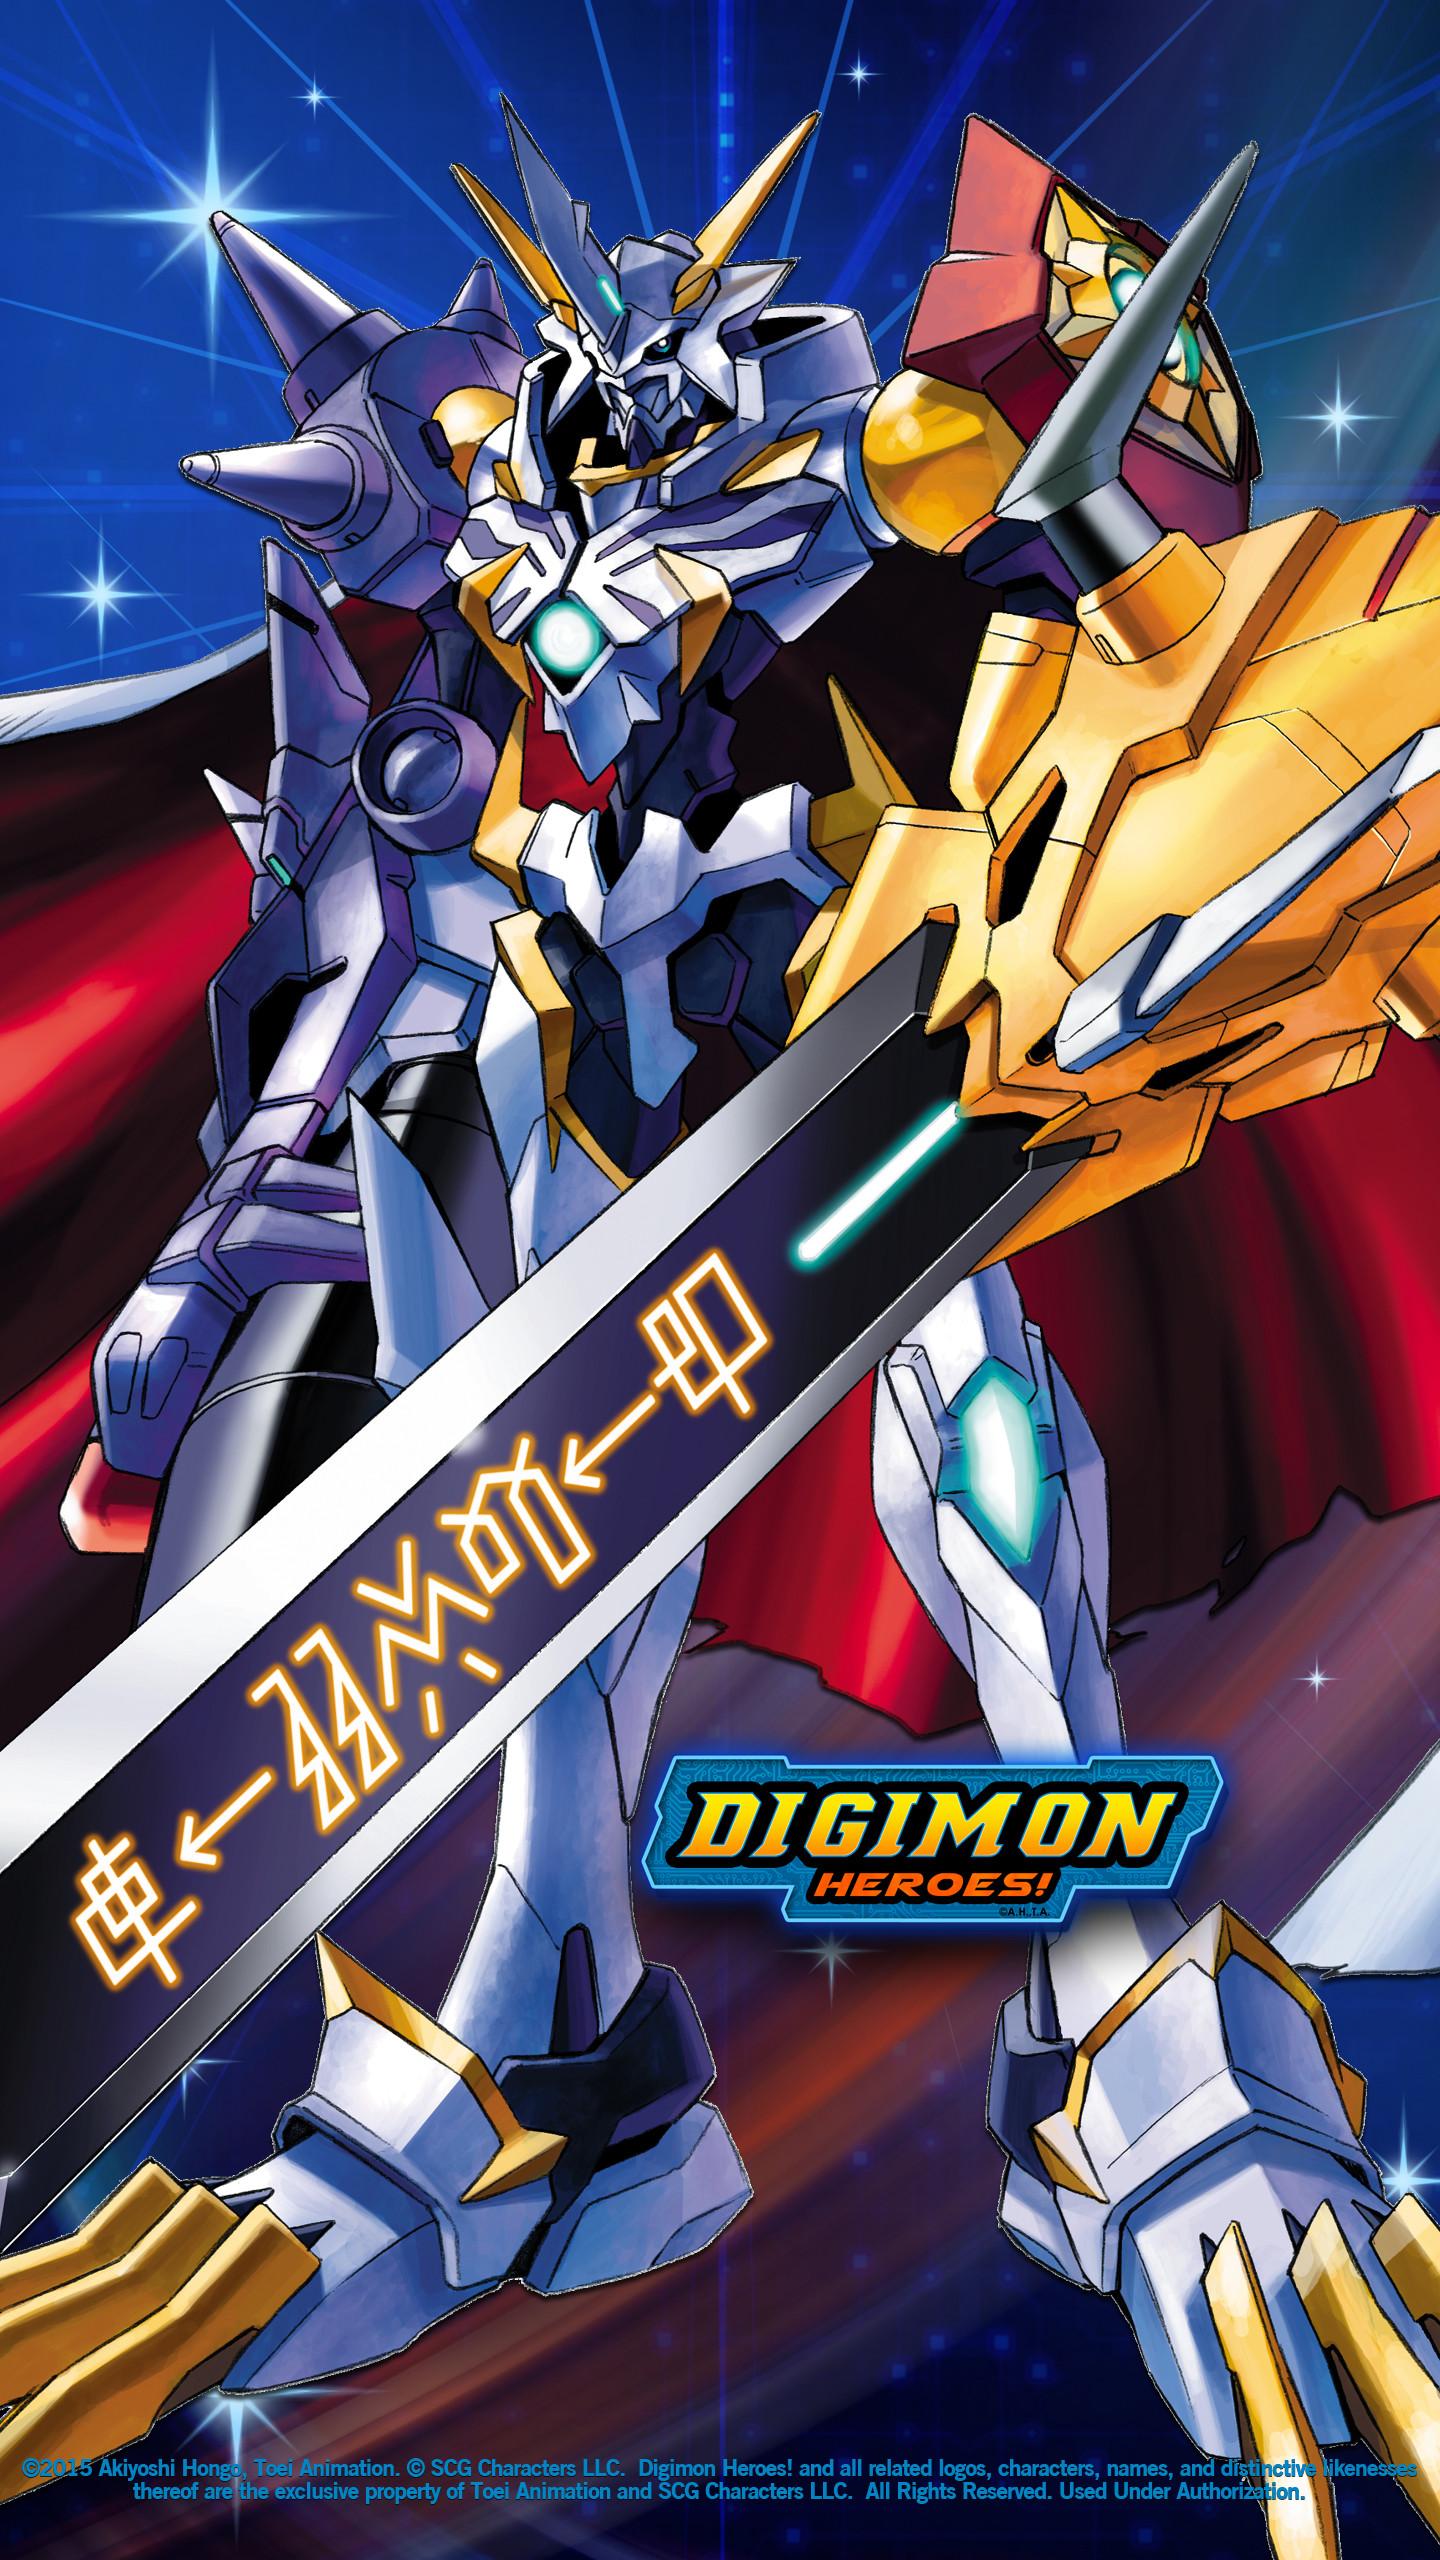 Digimon Wallpaper Hd 66 Images